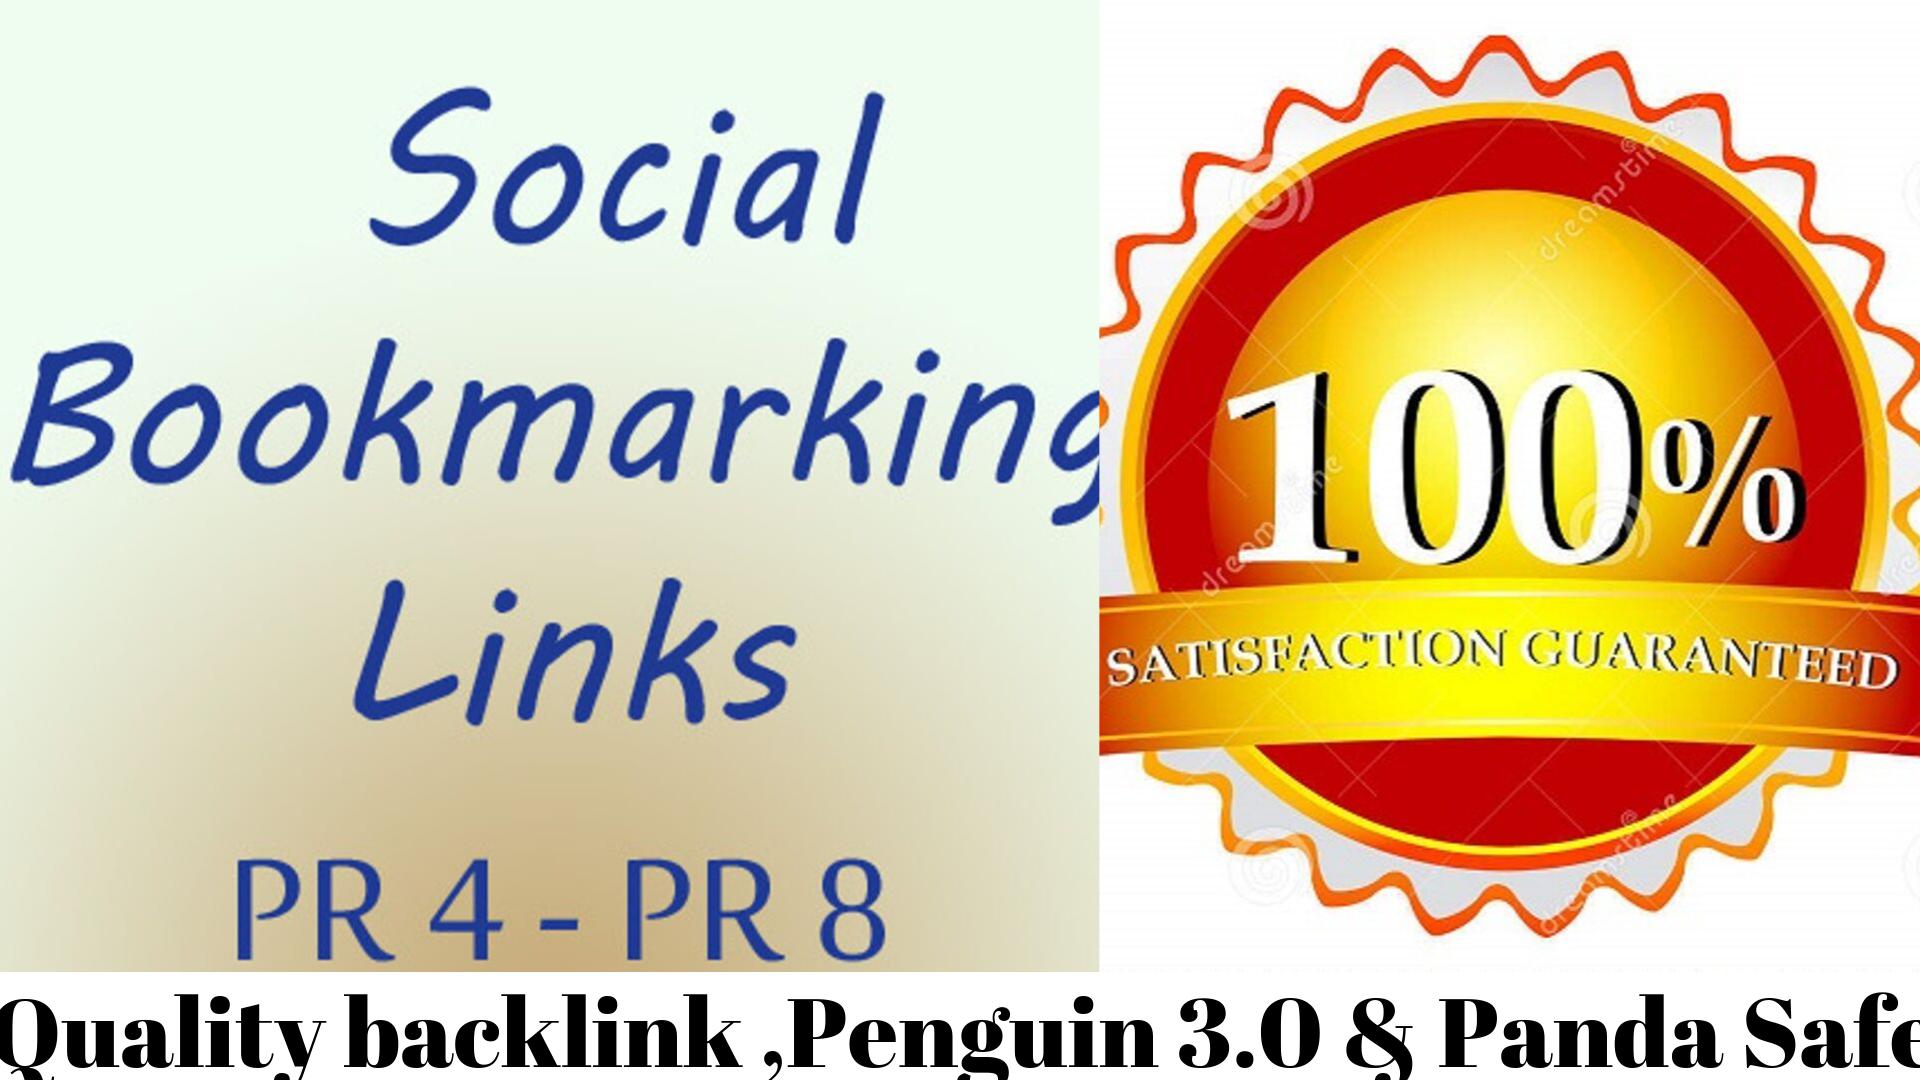 I Can Do 20 Quality Social Bookmarking Backlinks Manually With High DA PR